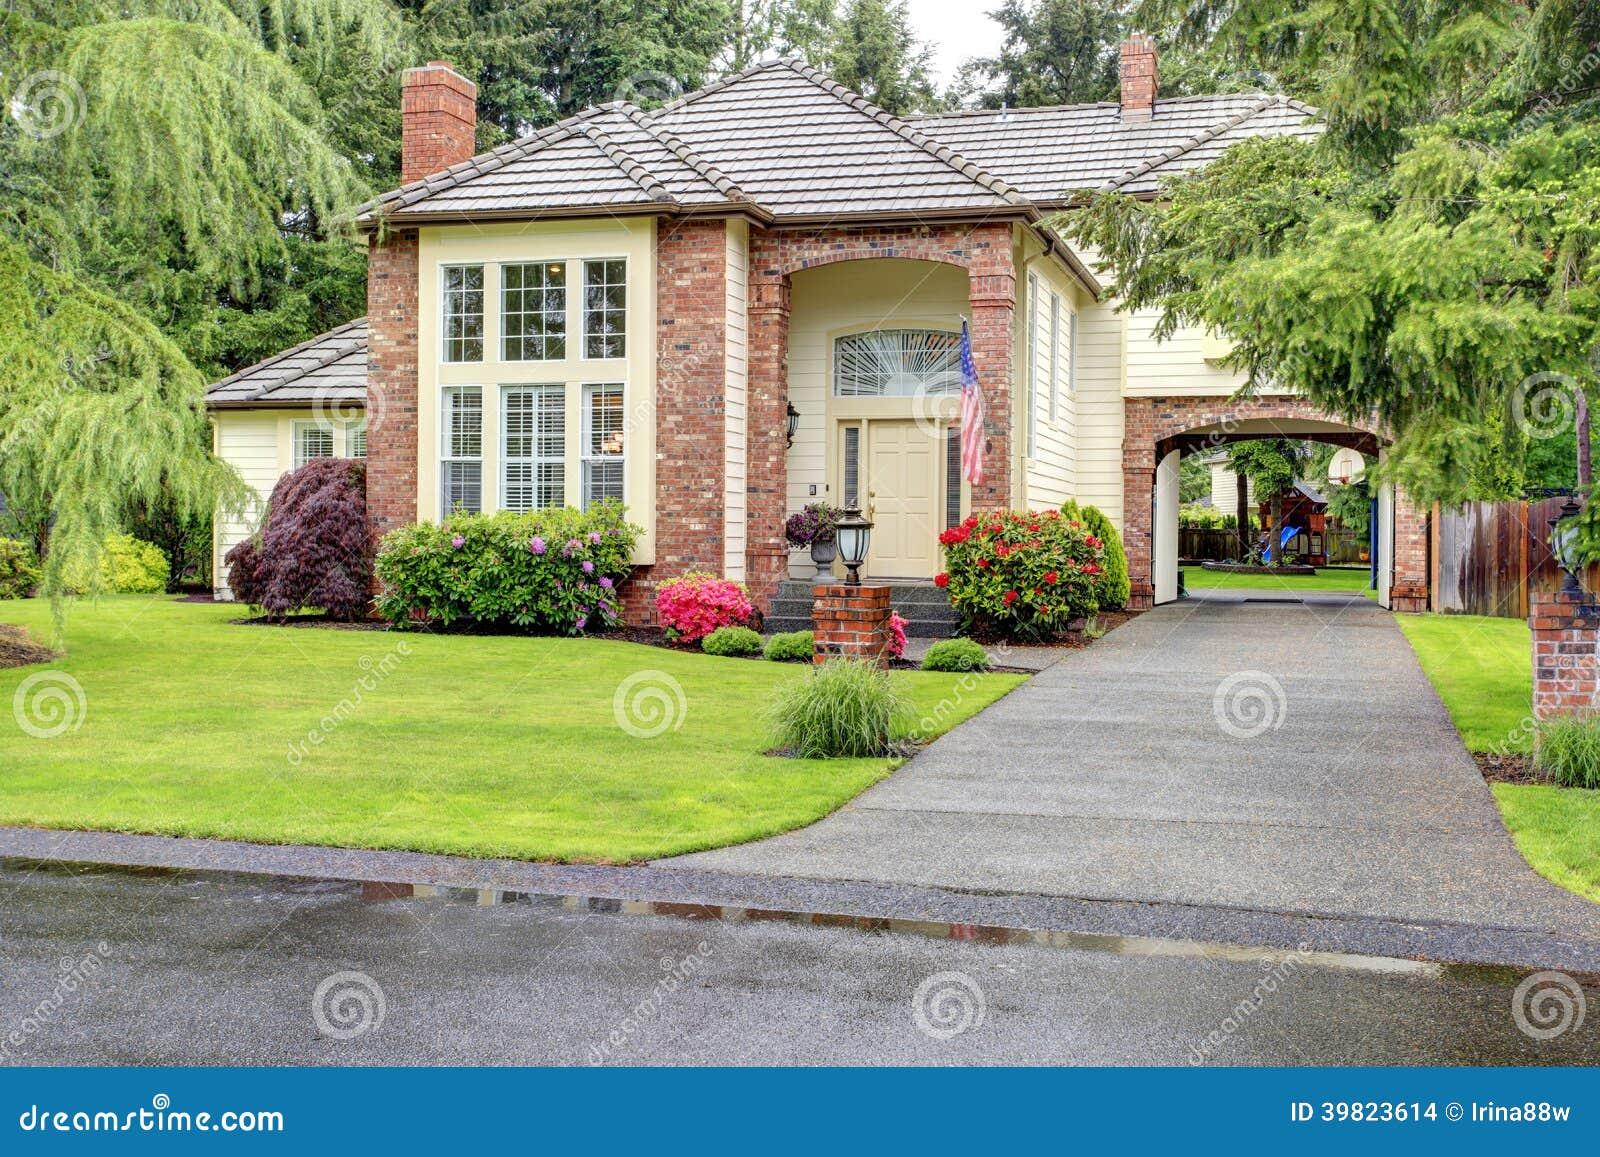 Luxury Brick House With Siding Trim Stock Photo Image